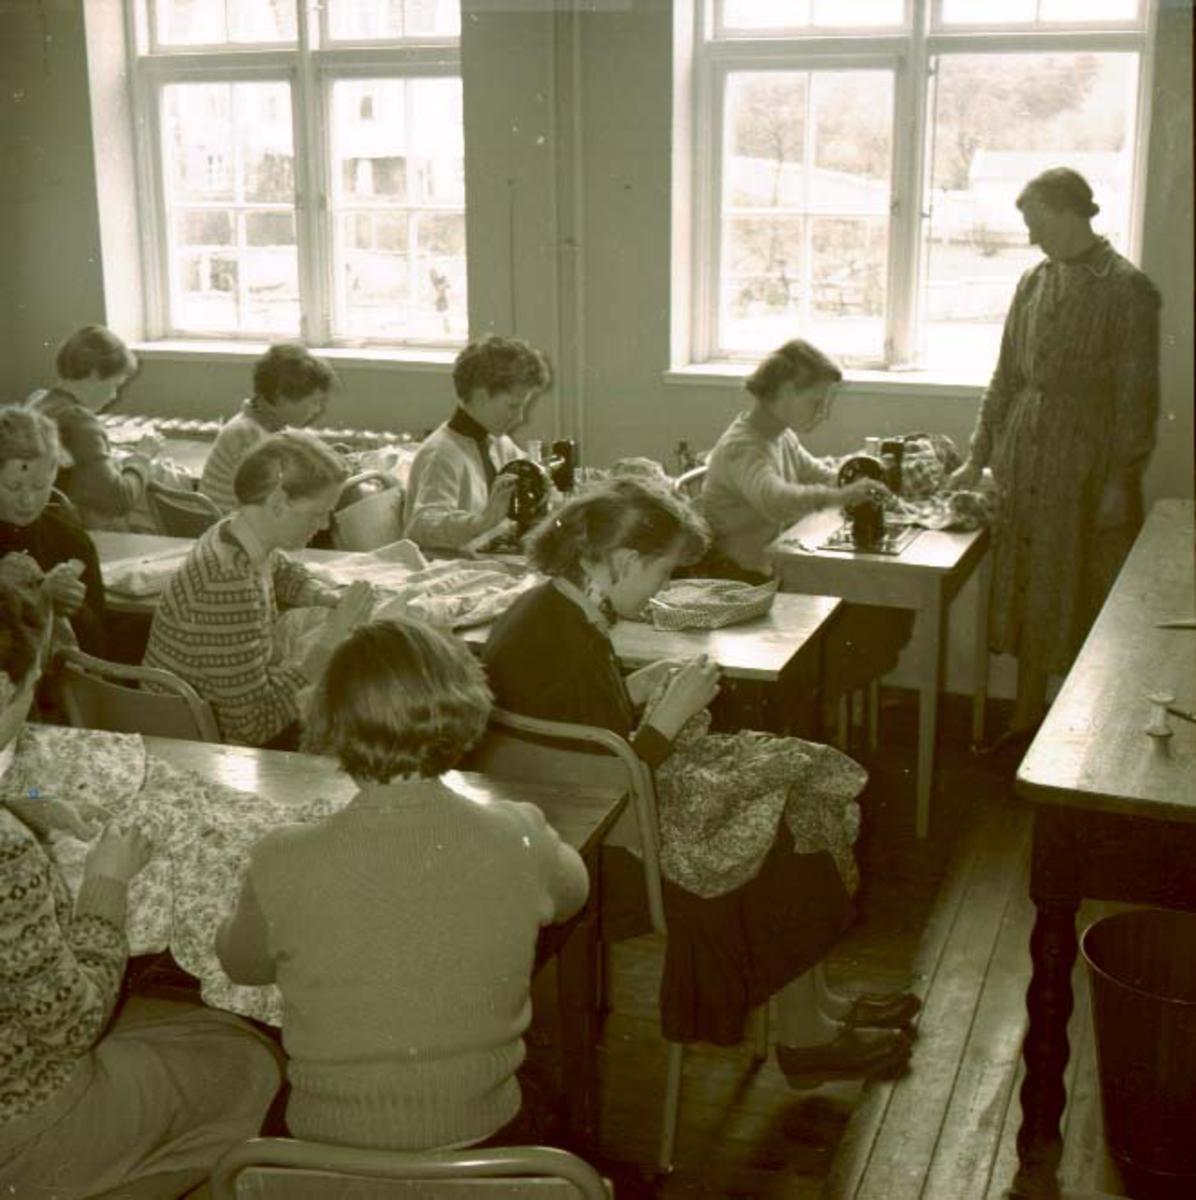 Interiør - Gruppe - Husmorskolen.Husmorskolen i Haugesund.